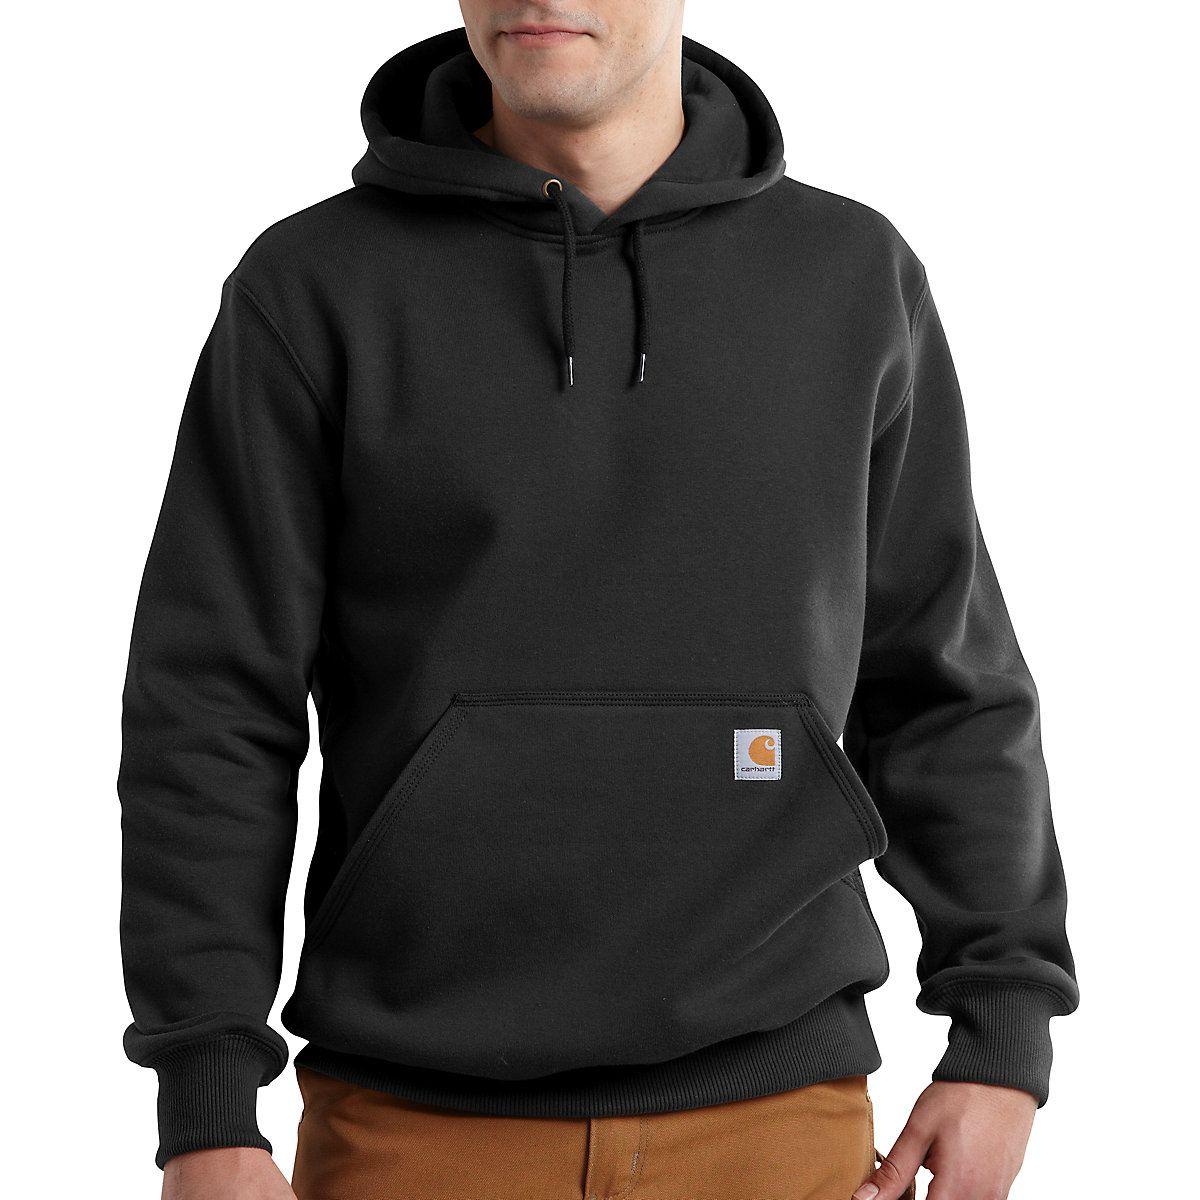 Carhartt Mens Midweight Hooded Sweatshirt Solid Long Sleeve Shirt